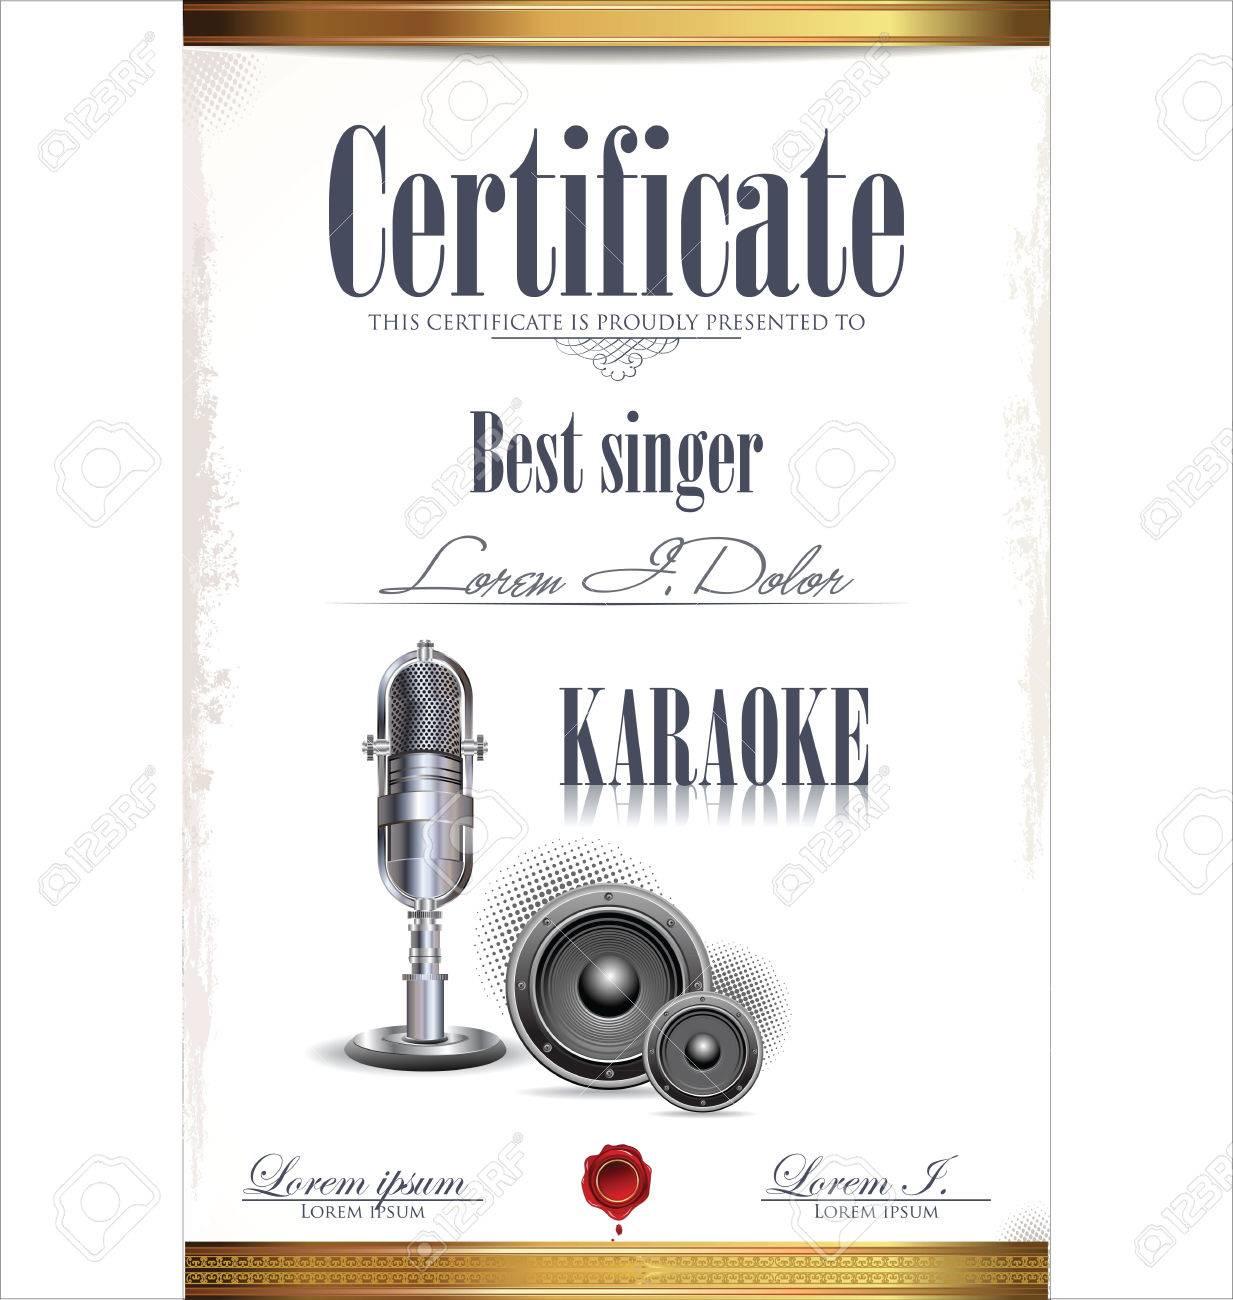 Karaoke certificate template best singer royalty free cliparts karaoke certificate template best singer stock vector 23320095 yadclub Images